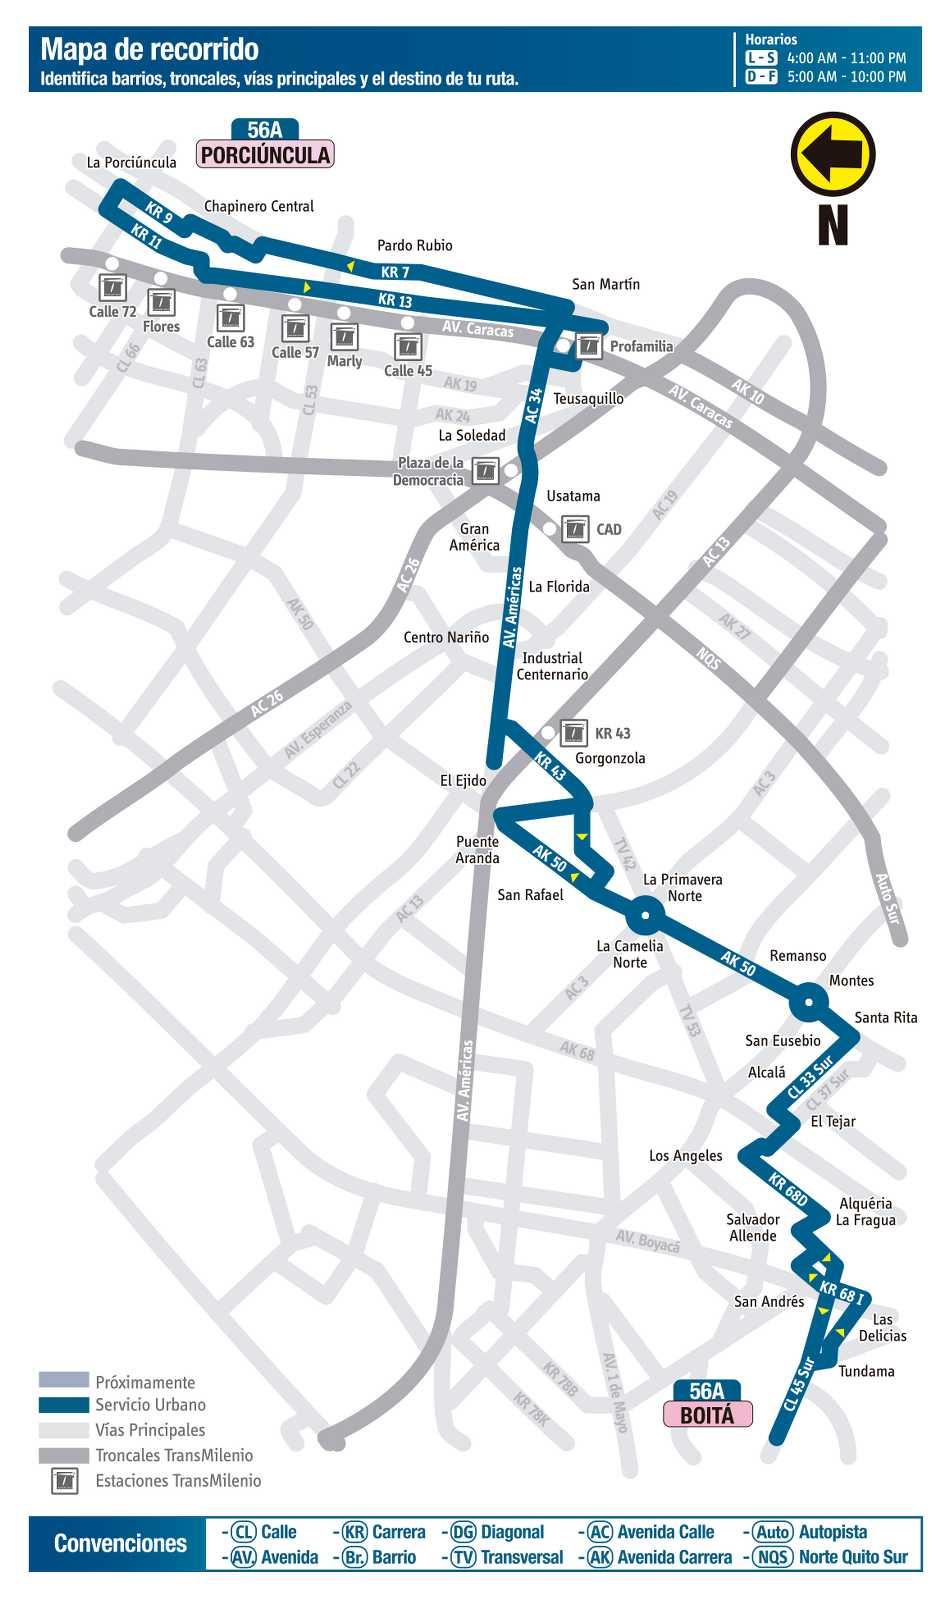 Ruta SITP: Ruta 56A Boitá ↔ Porciúncula (mapa)